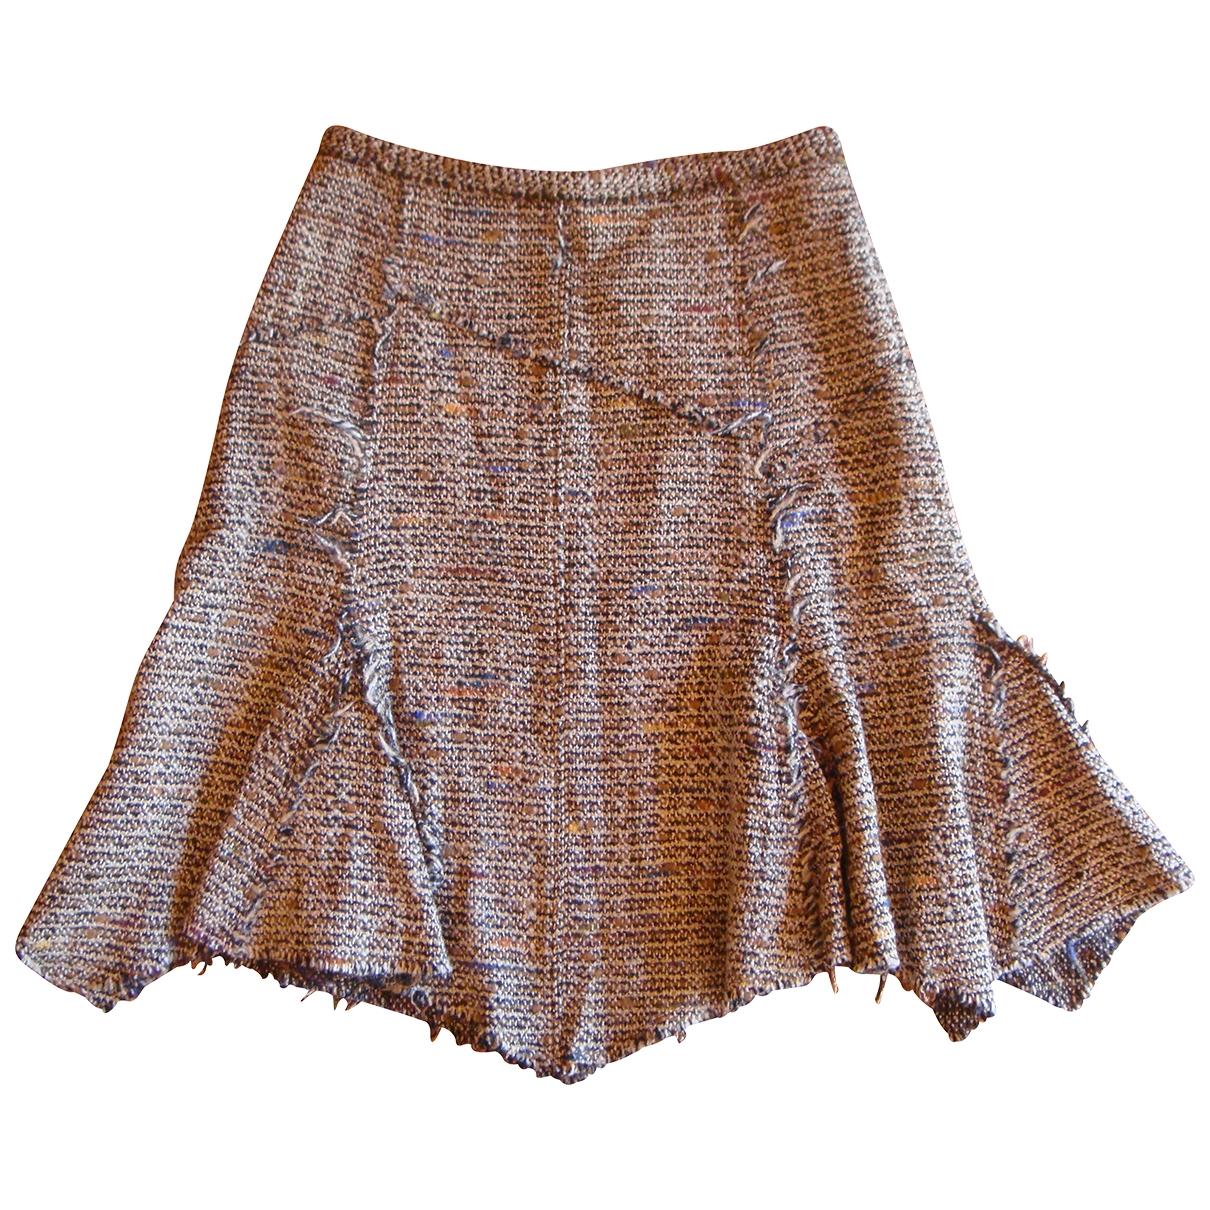 Essentiel Antwerp - Jupe   pour femme en laine - beige